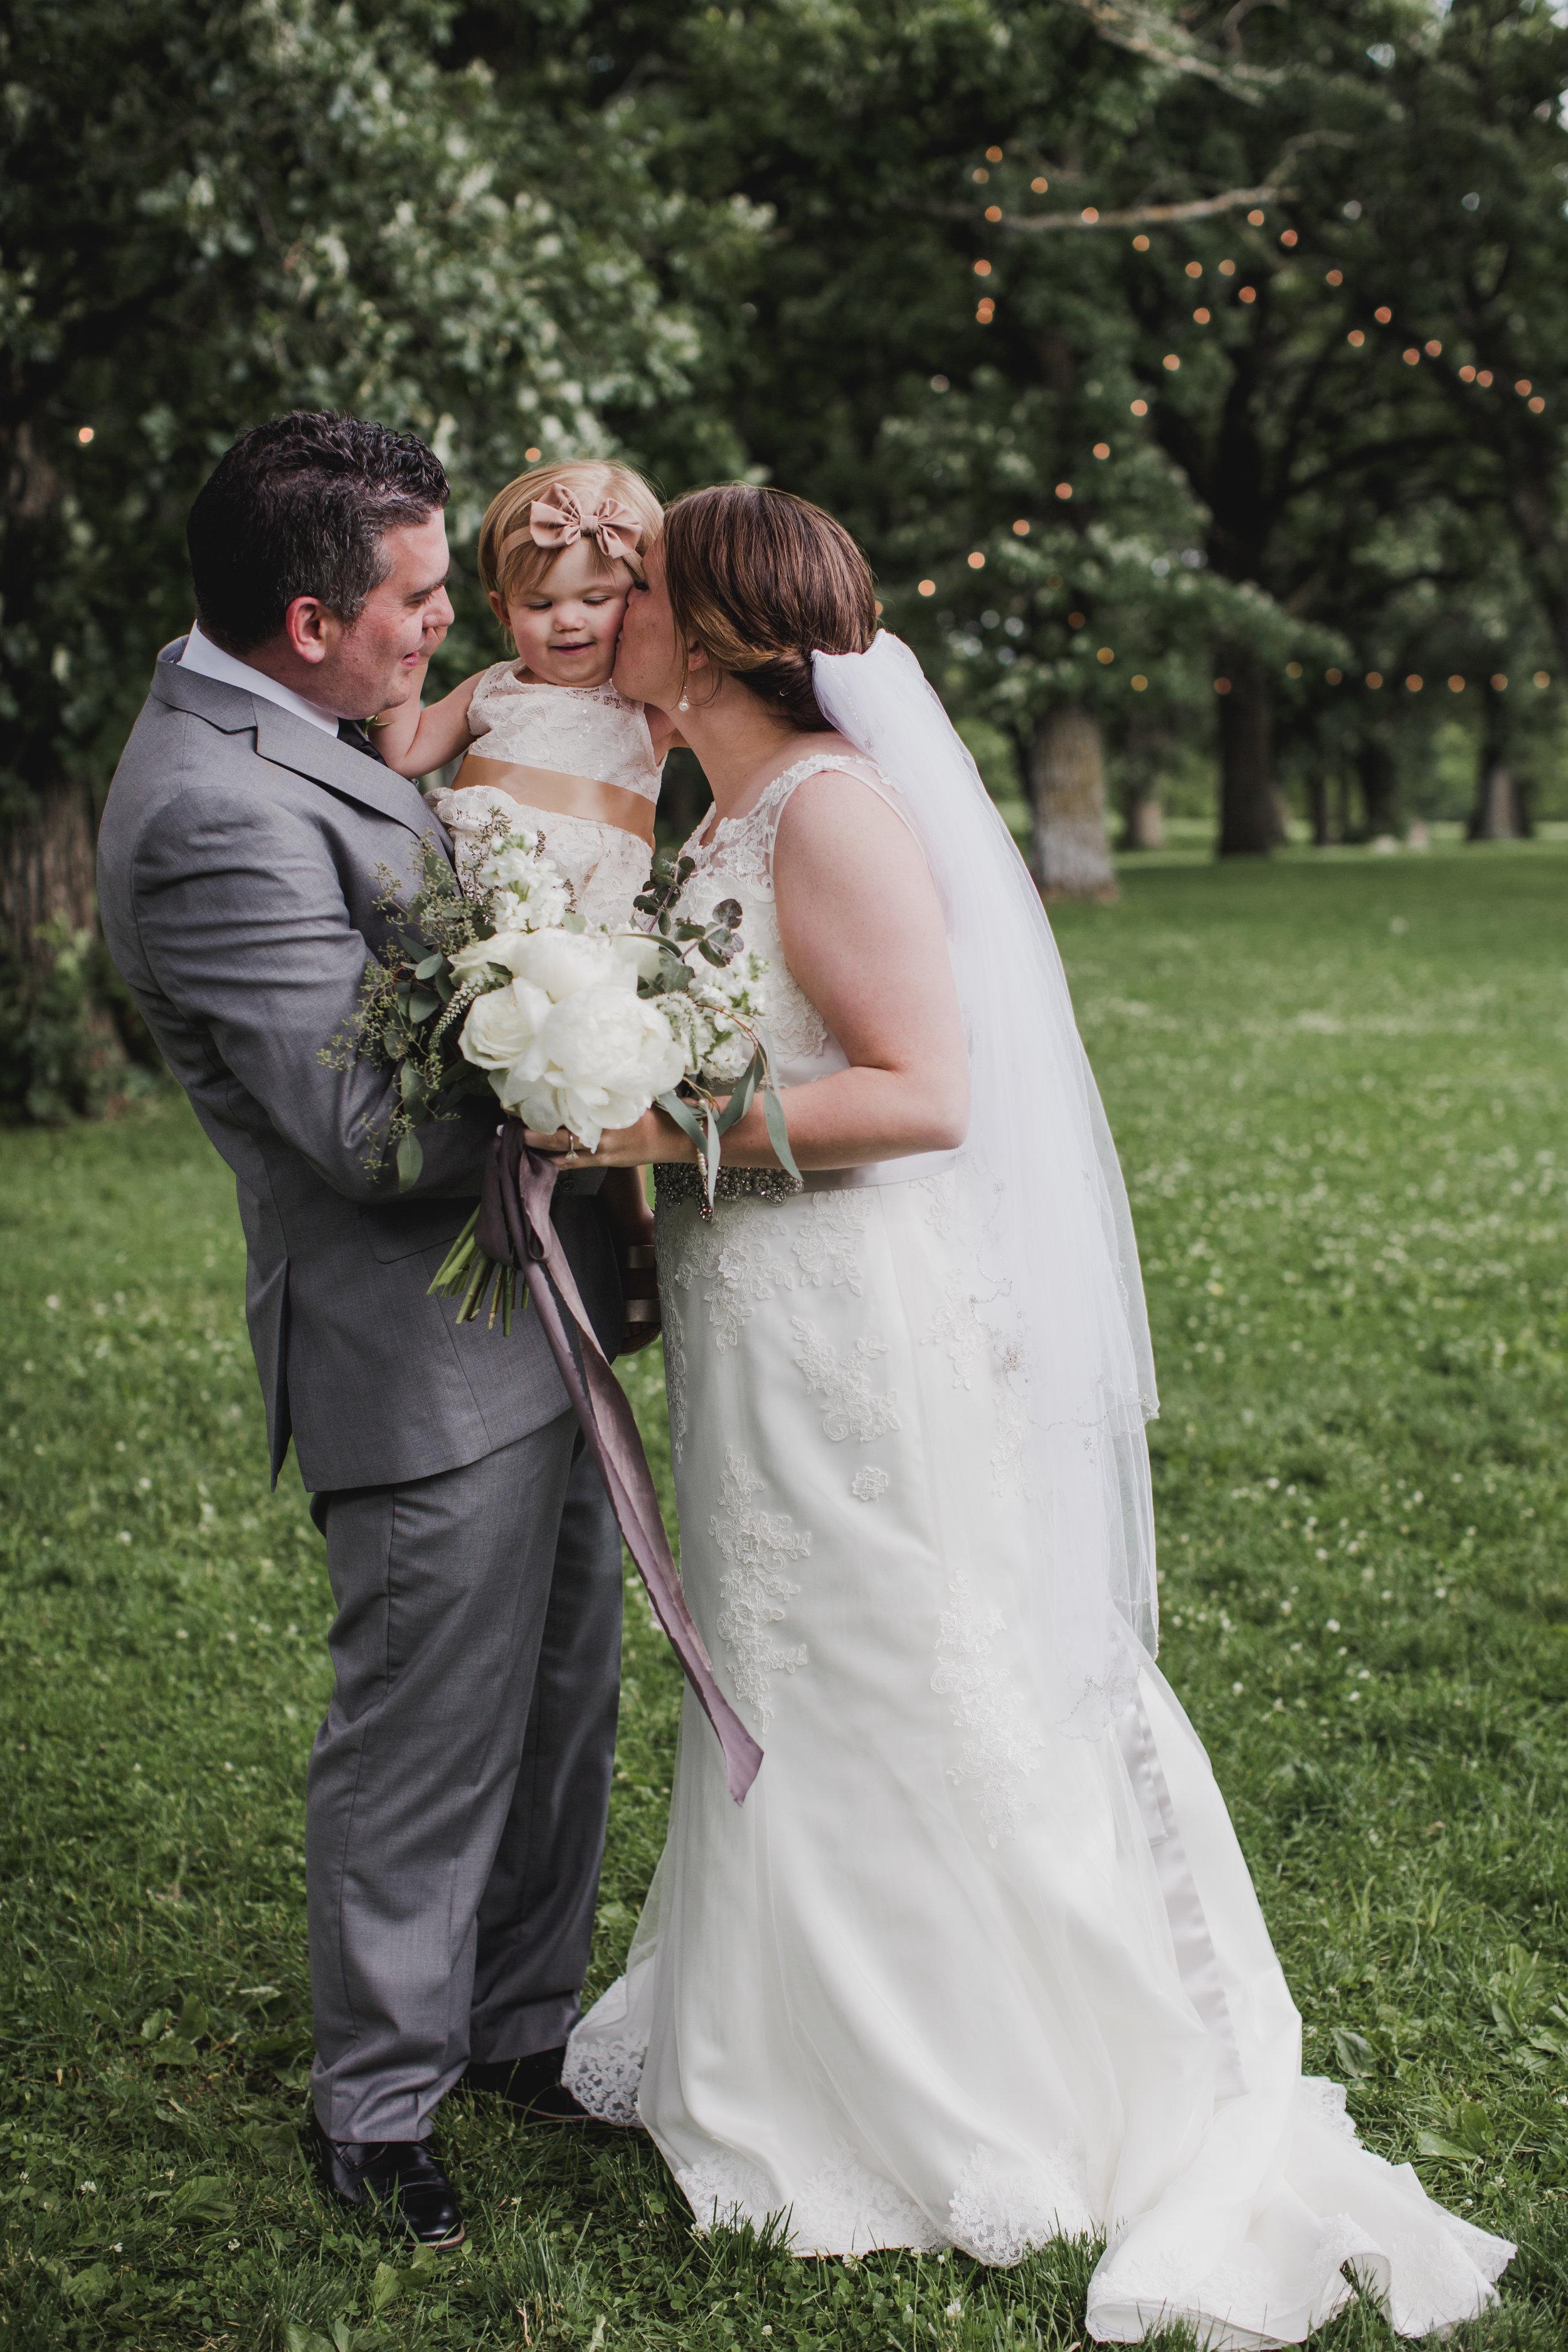 Sibyl_Sophia_Wedding_Florist_Mason_City_Diamond_Oaks_Marriage.jpg.jpg